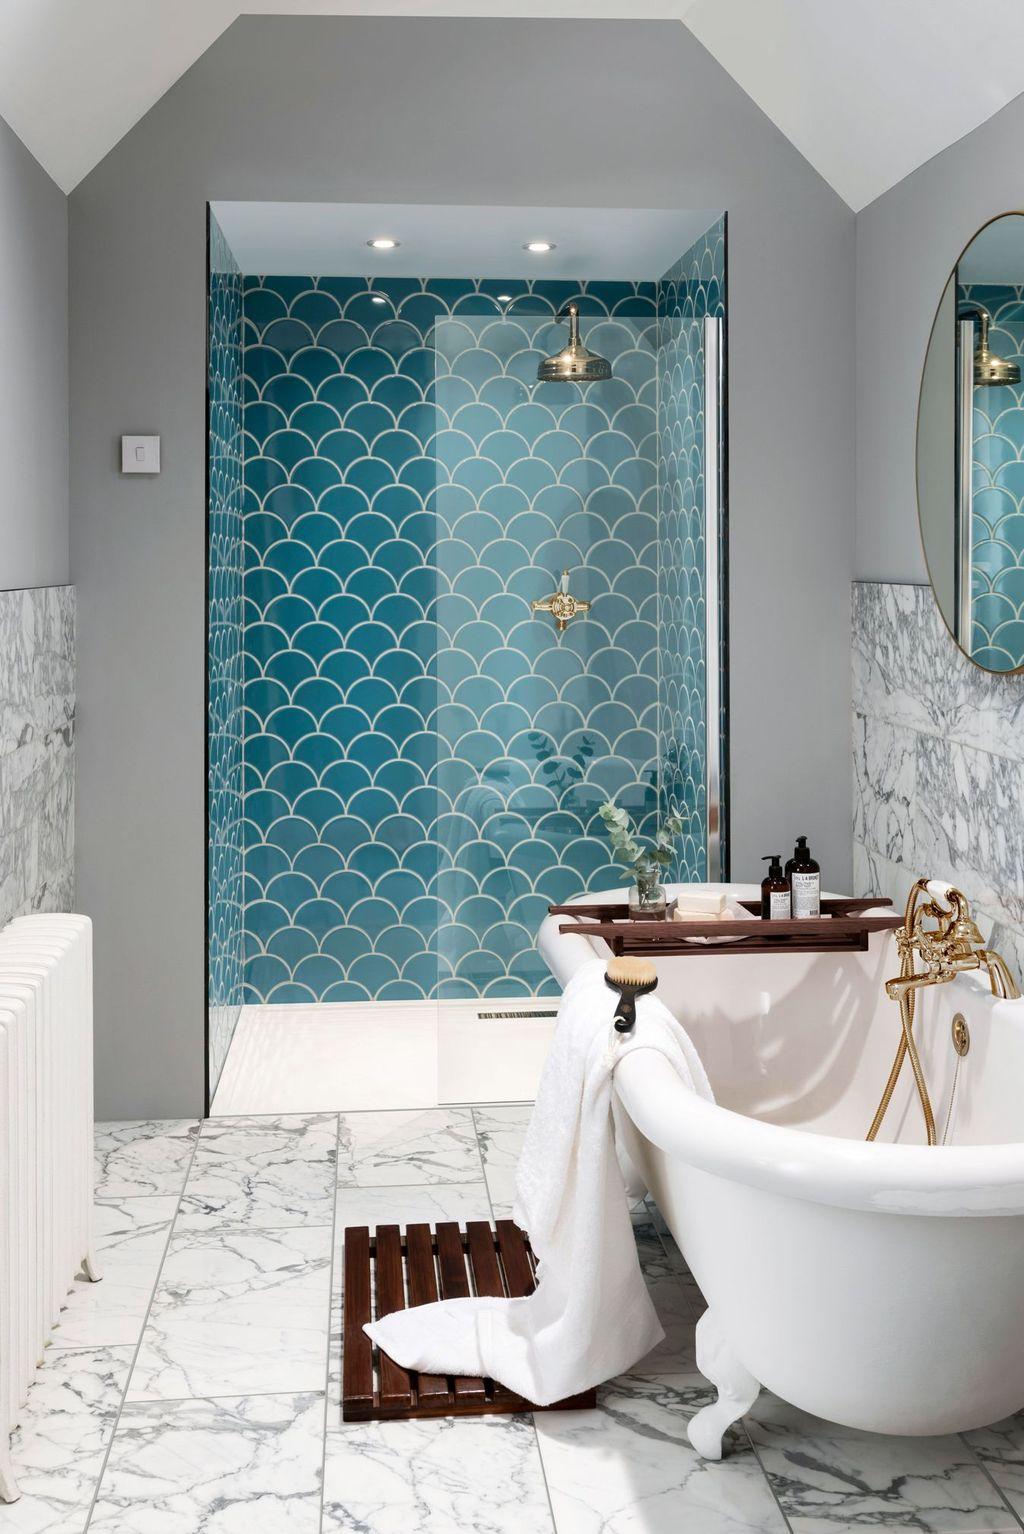 Unusual Bathroom Design Ideas You Need To Know 11